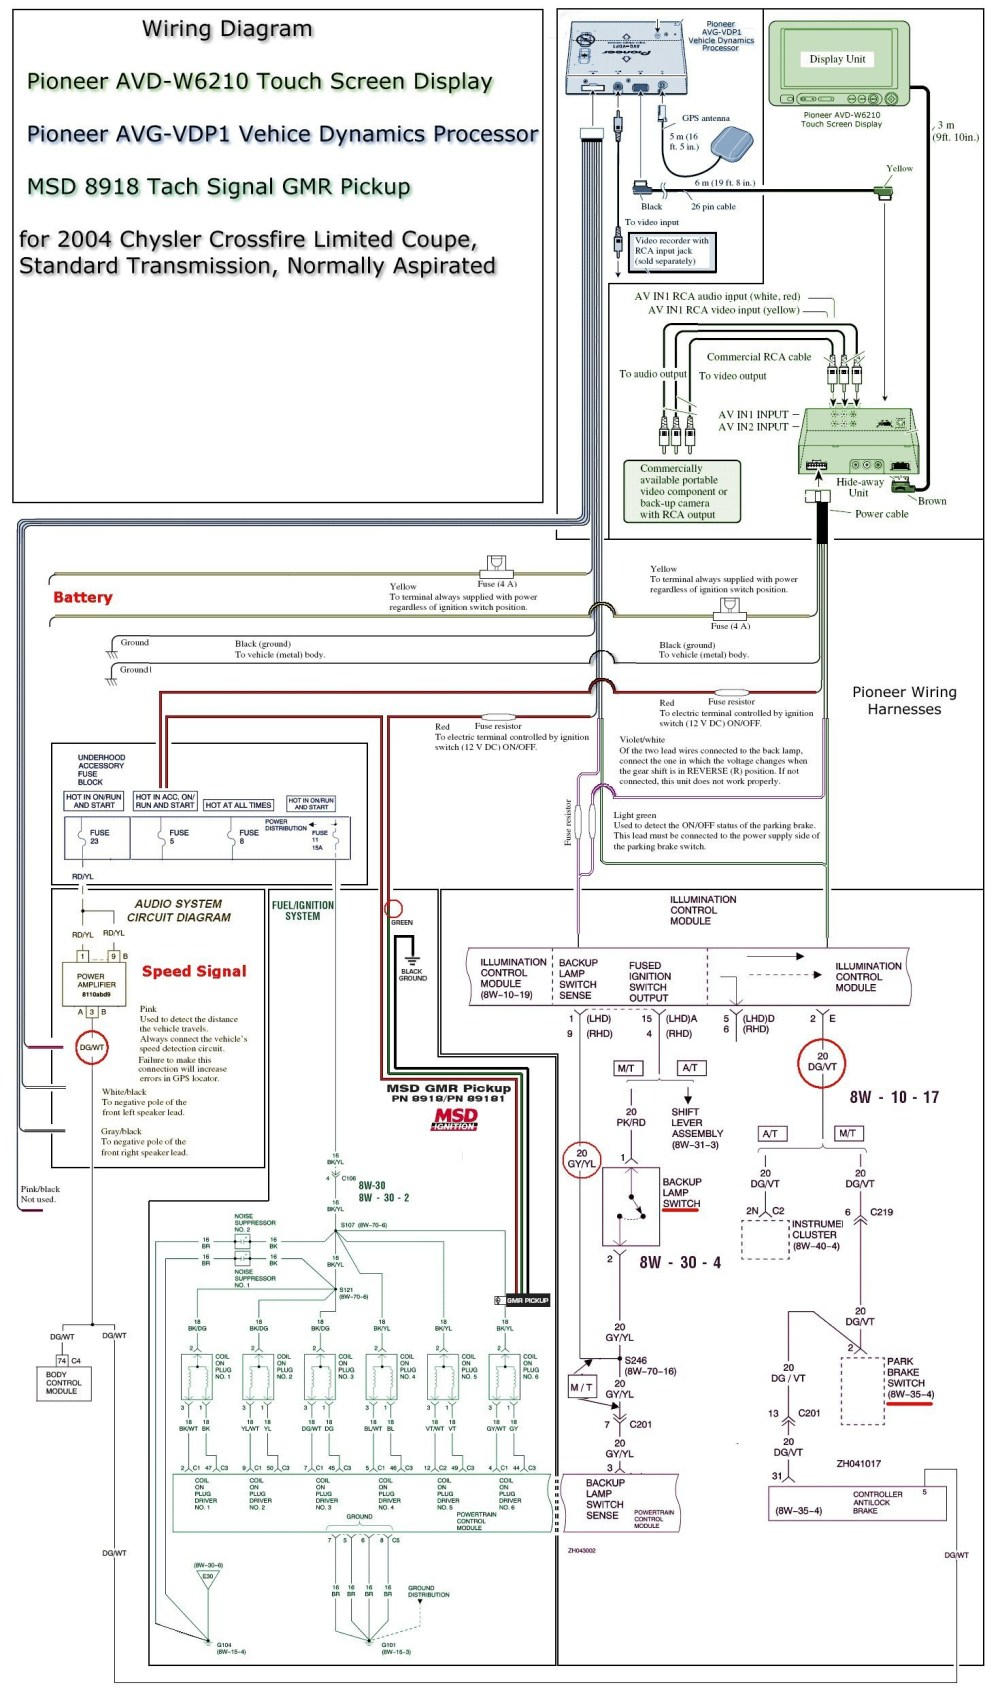 medium resolution of pioneer avh x2800bs wiring diagram for ranger wiring diagrams data 2013 avh p6500dvd wiring diagram